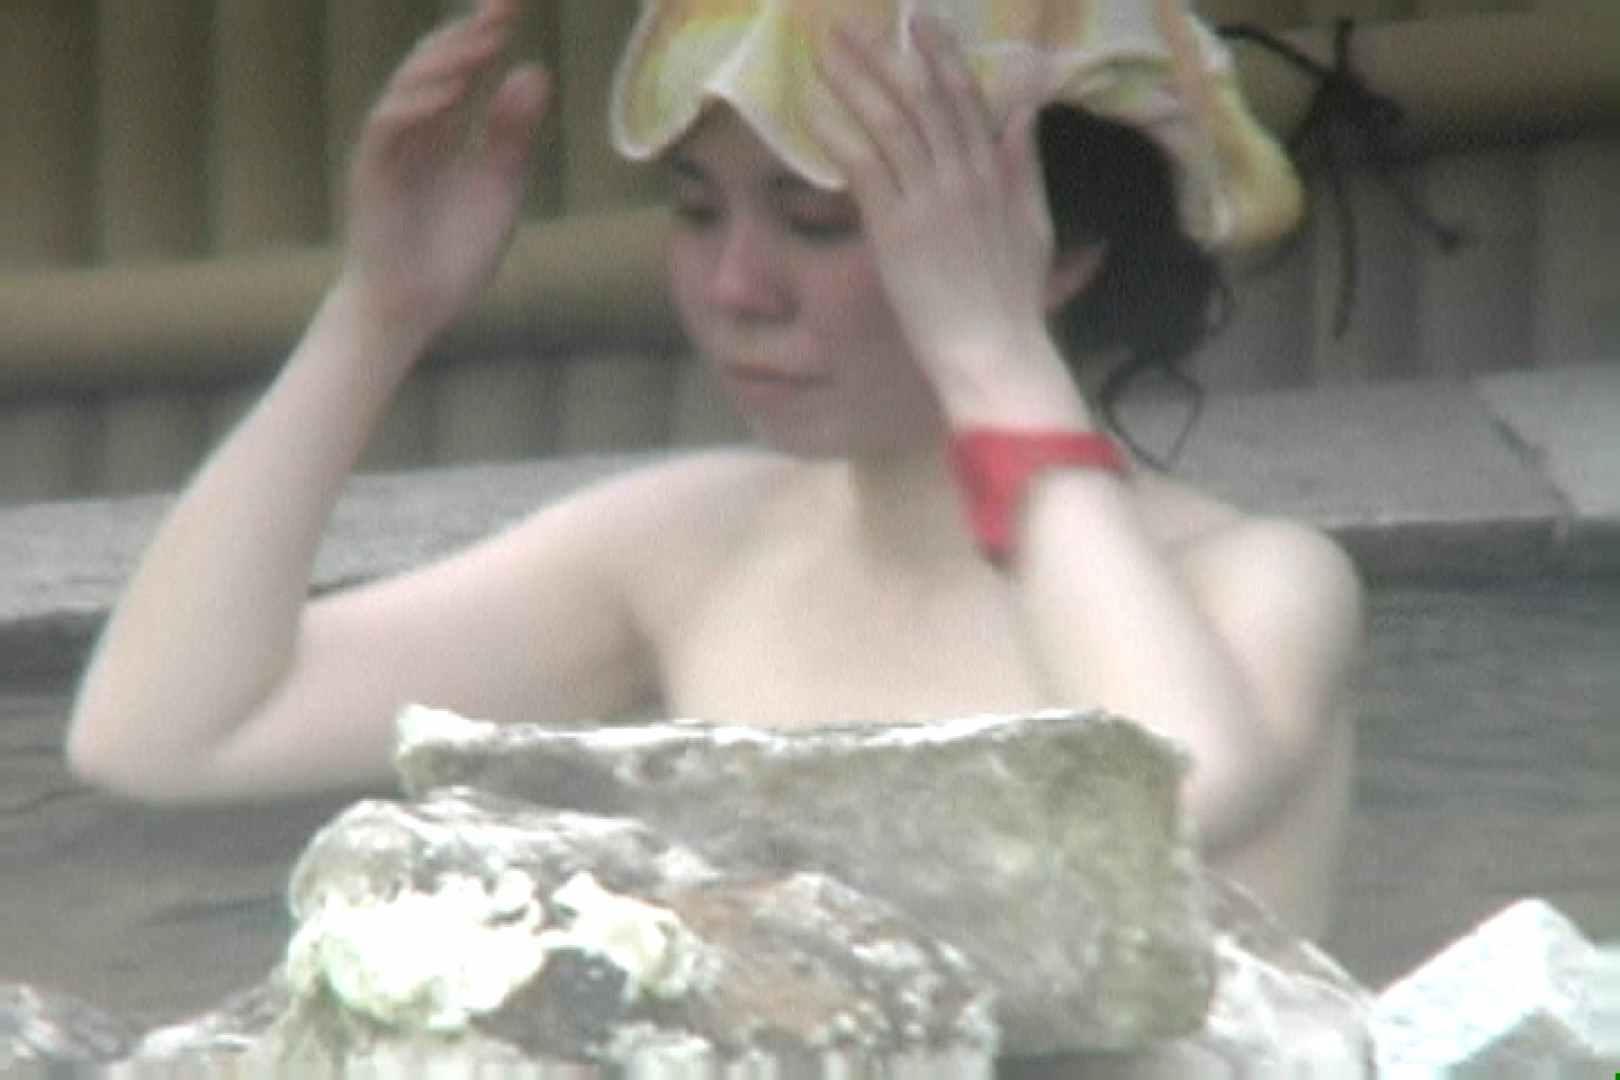 Aquaな露天風呂Vol.687 盗撮シリーズ | 露天風呂編  93PIX 25